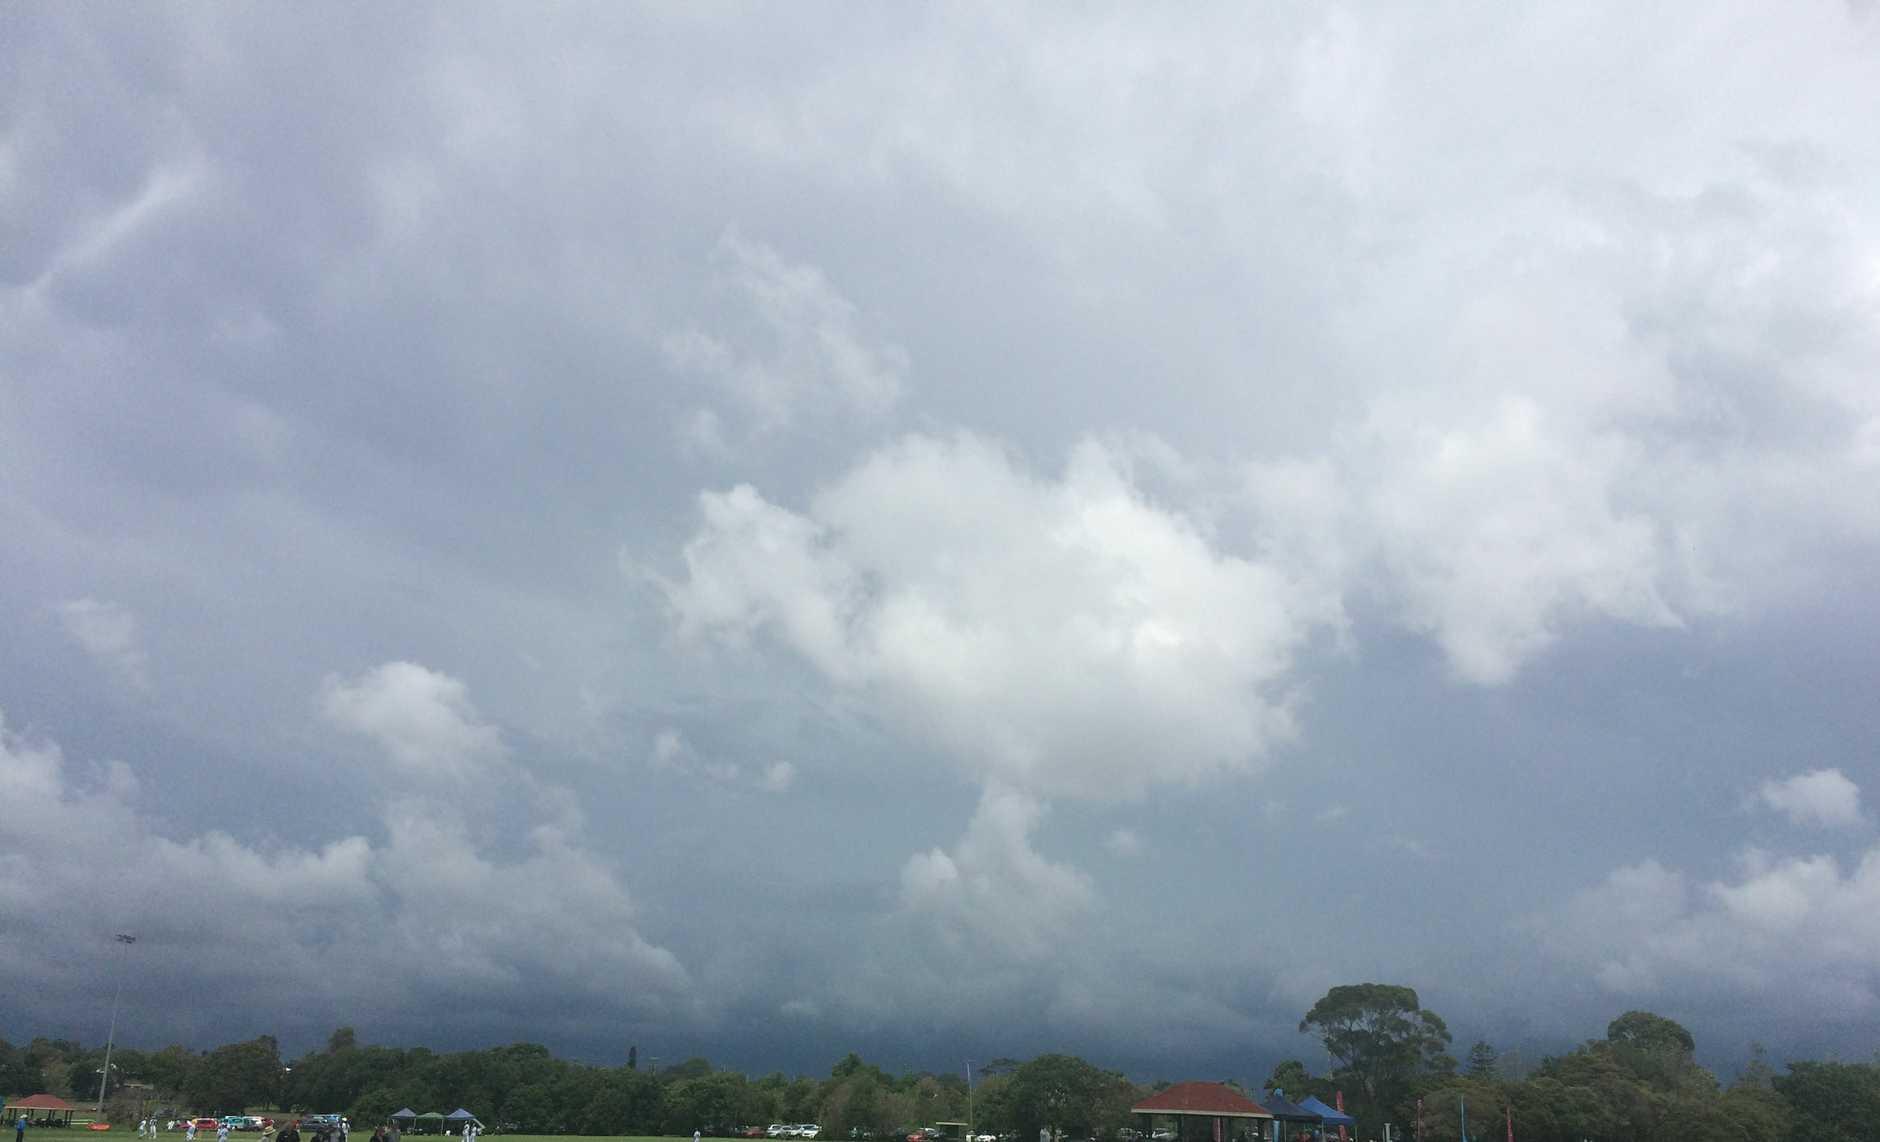 Dark skies above Captain Cook Oval.